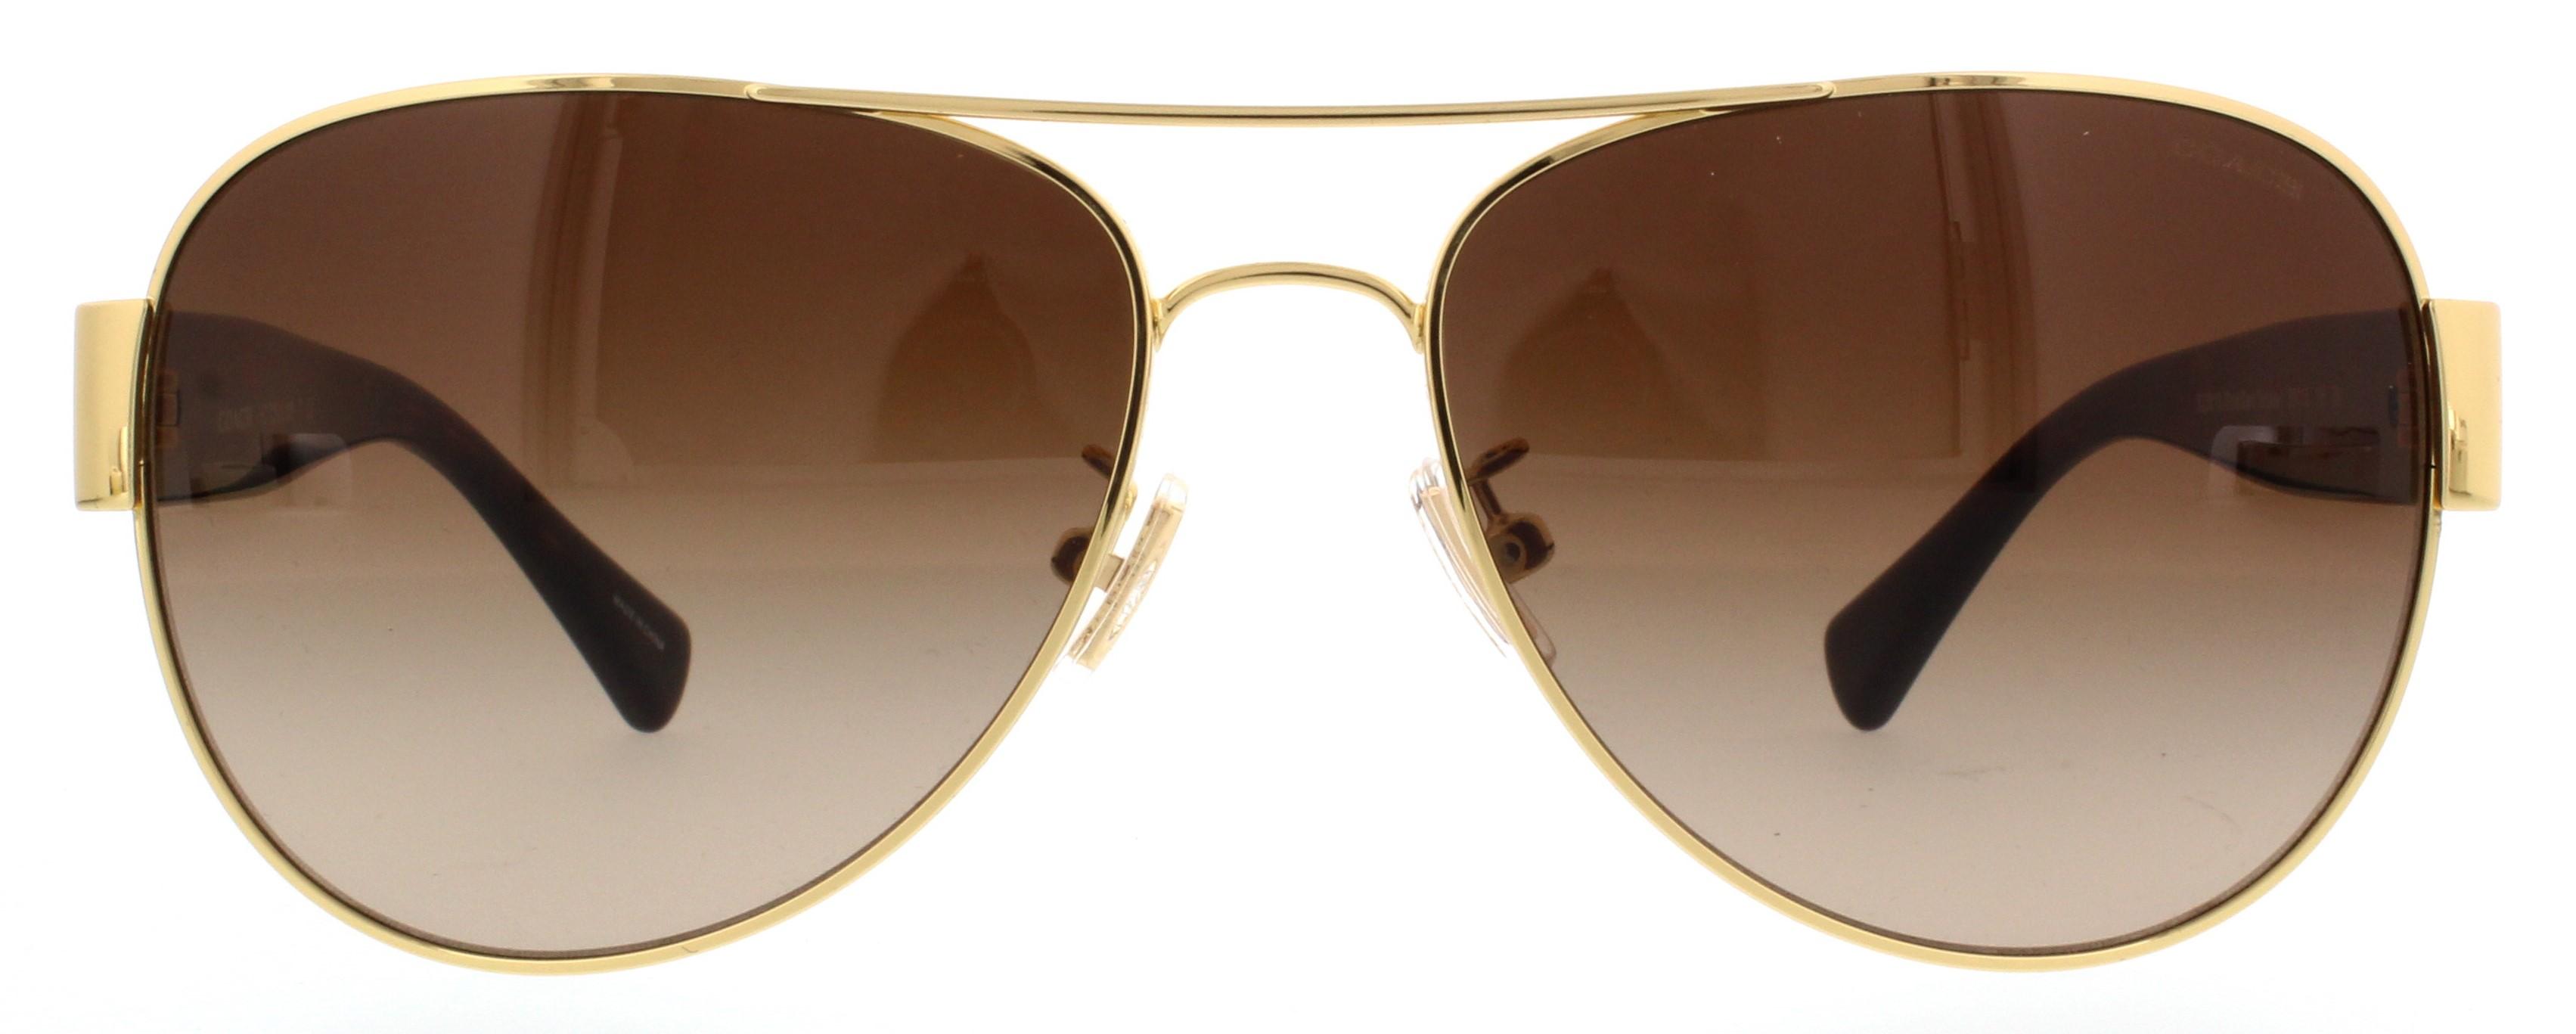 68314d43bfa7f ... free shipping picture of coach sunglasses hc7059 l138 dc134 0c38d